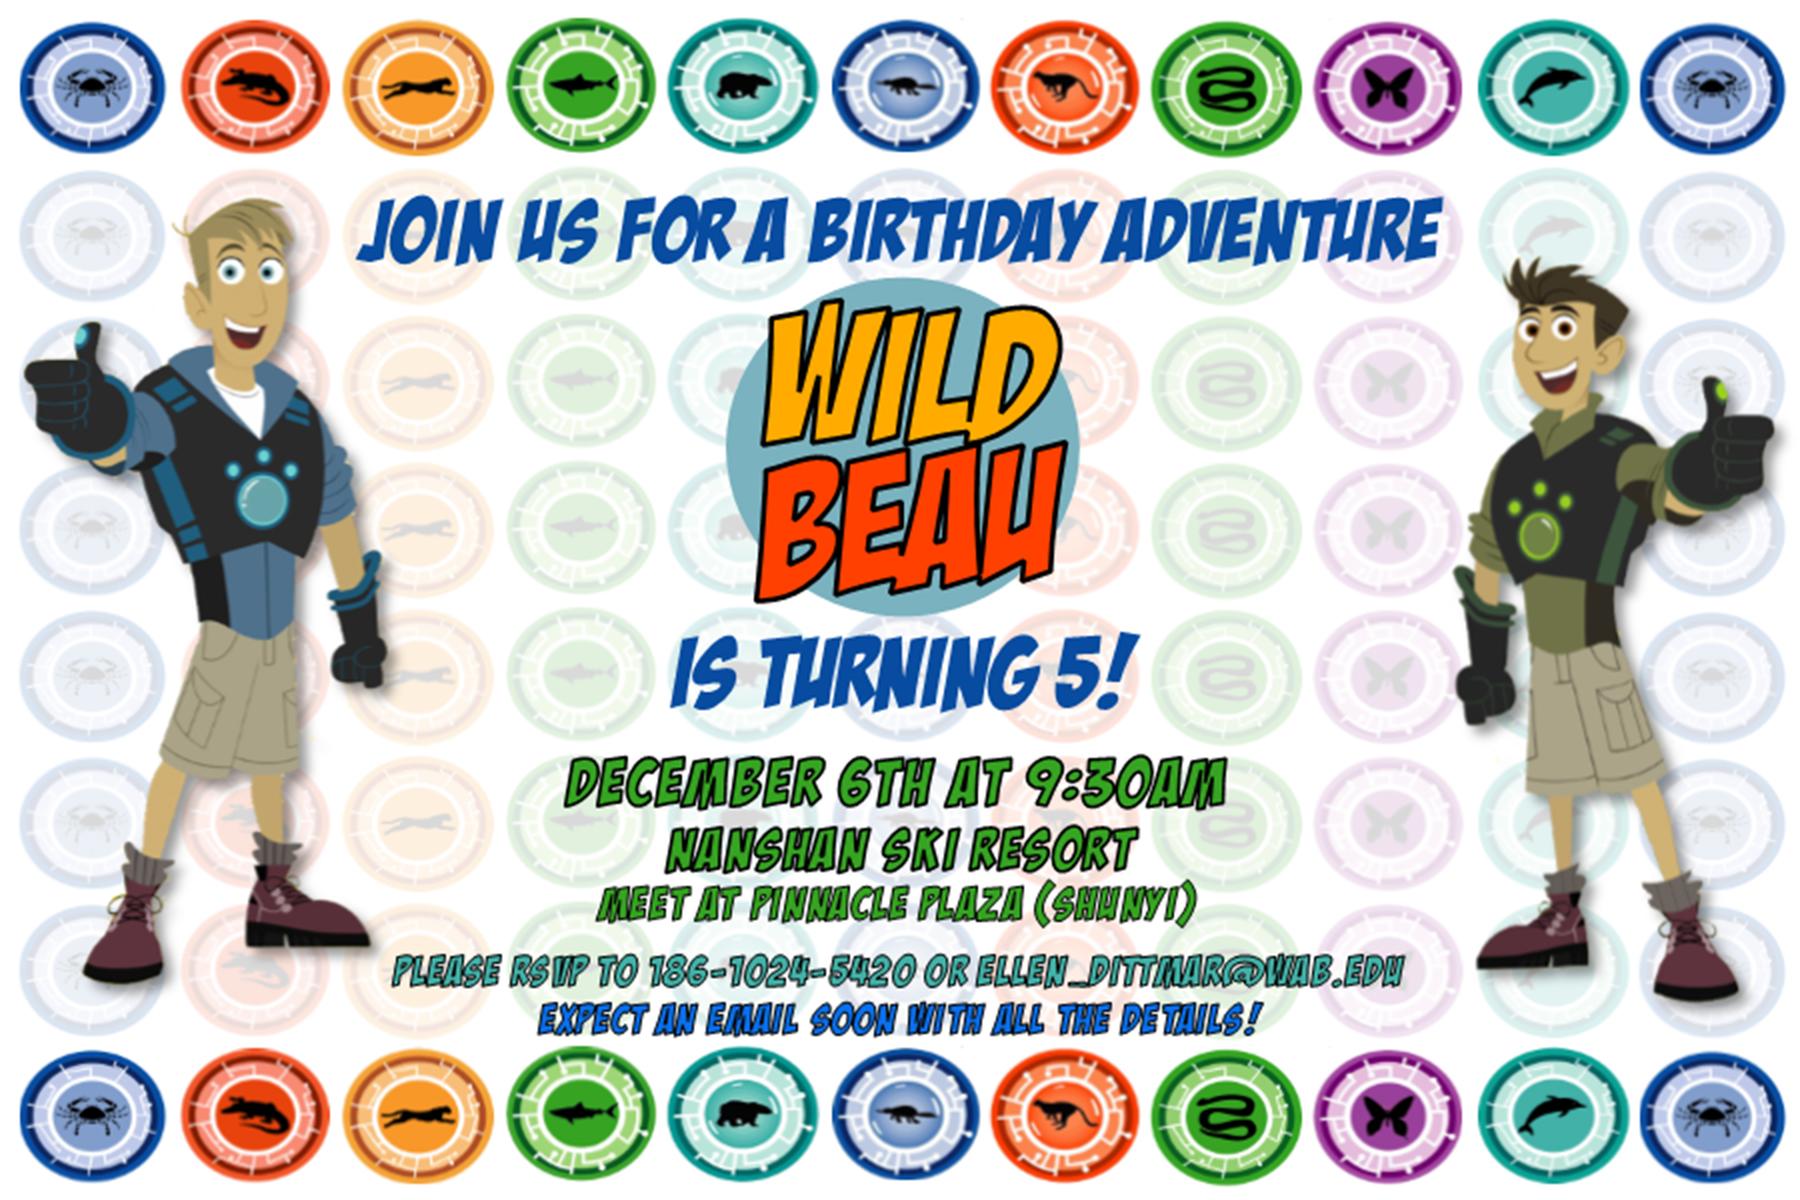 Beau Birthday Invitation